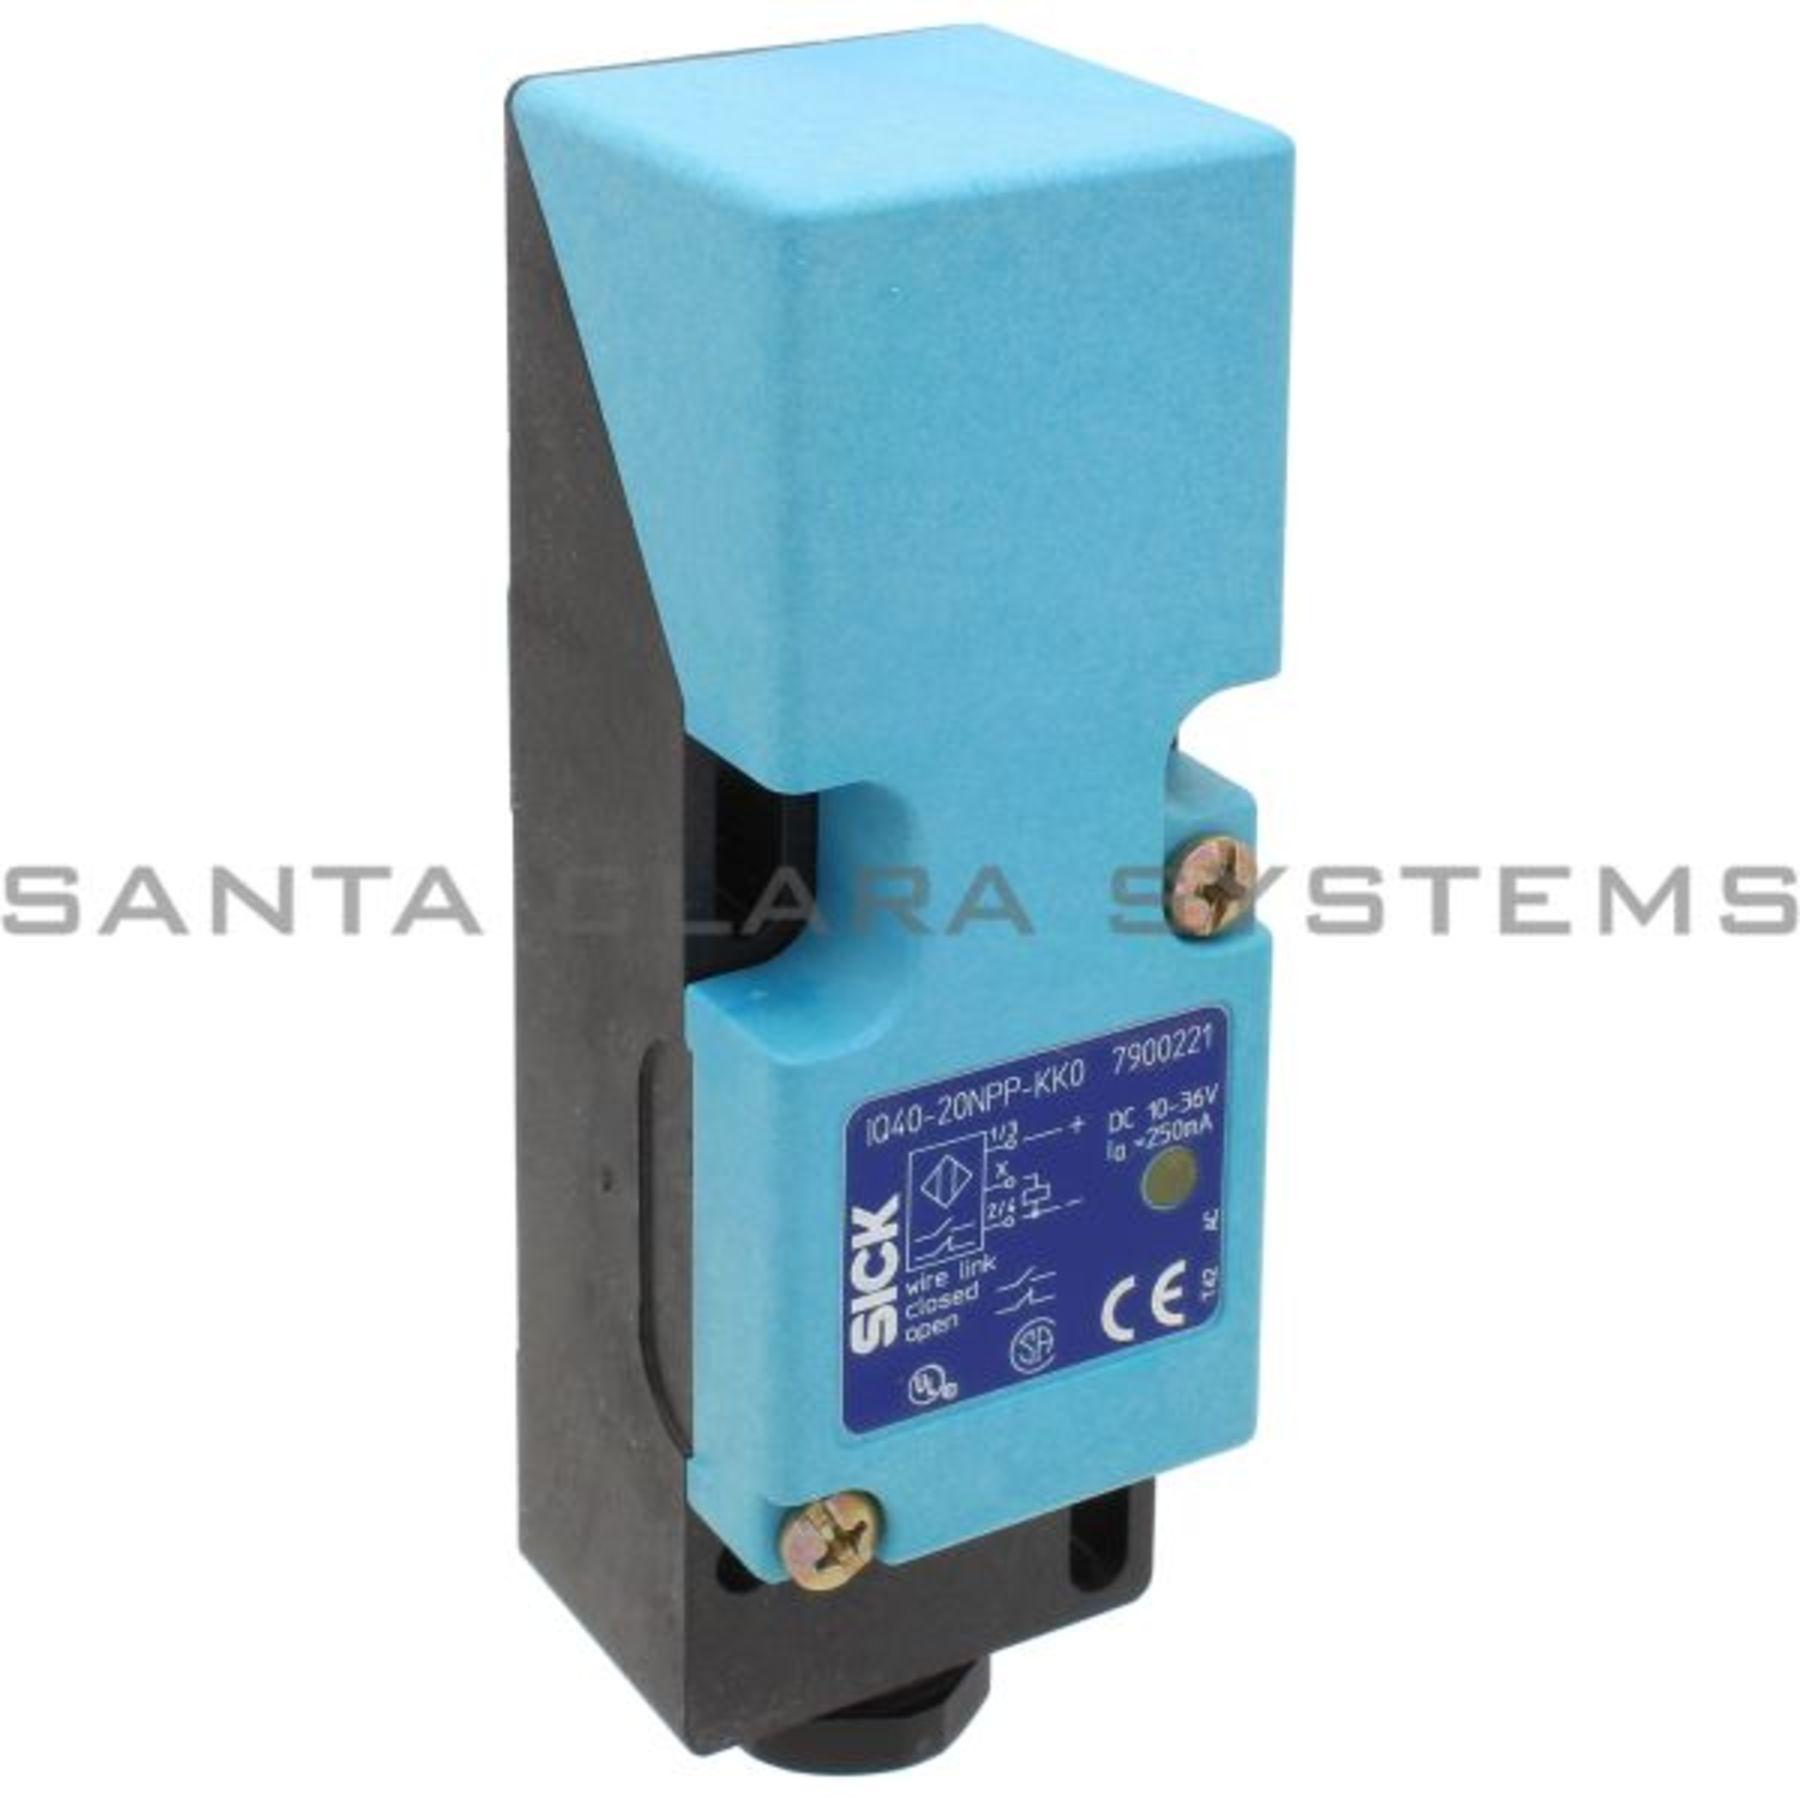 IQ40-20NPP-KK0 Inductive Proximity Sensor Unshielded 3-Wire ...